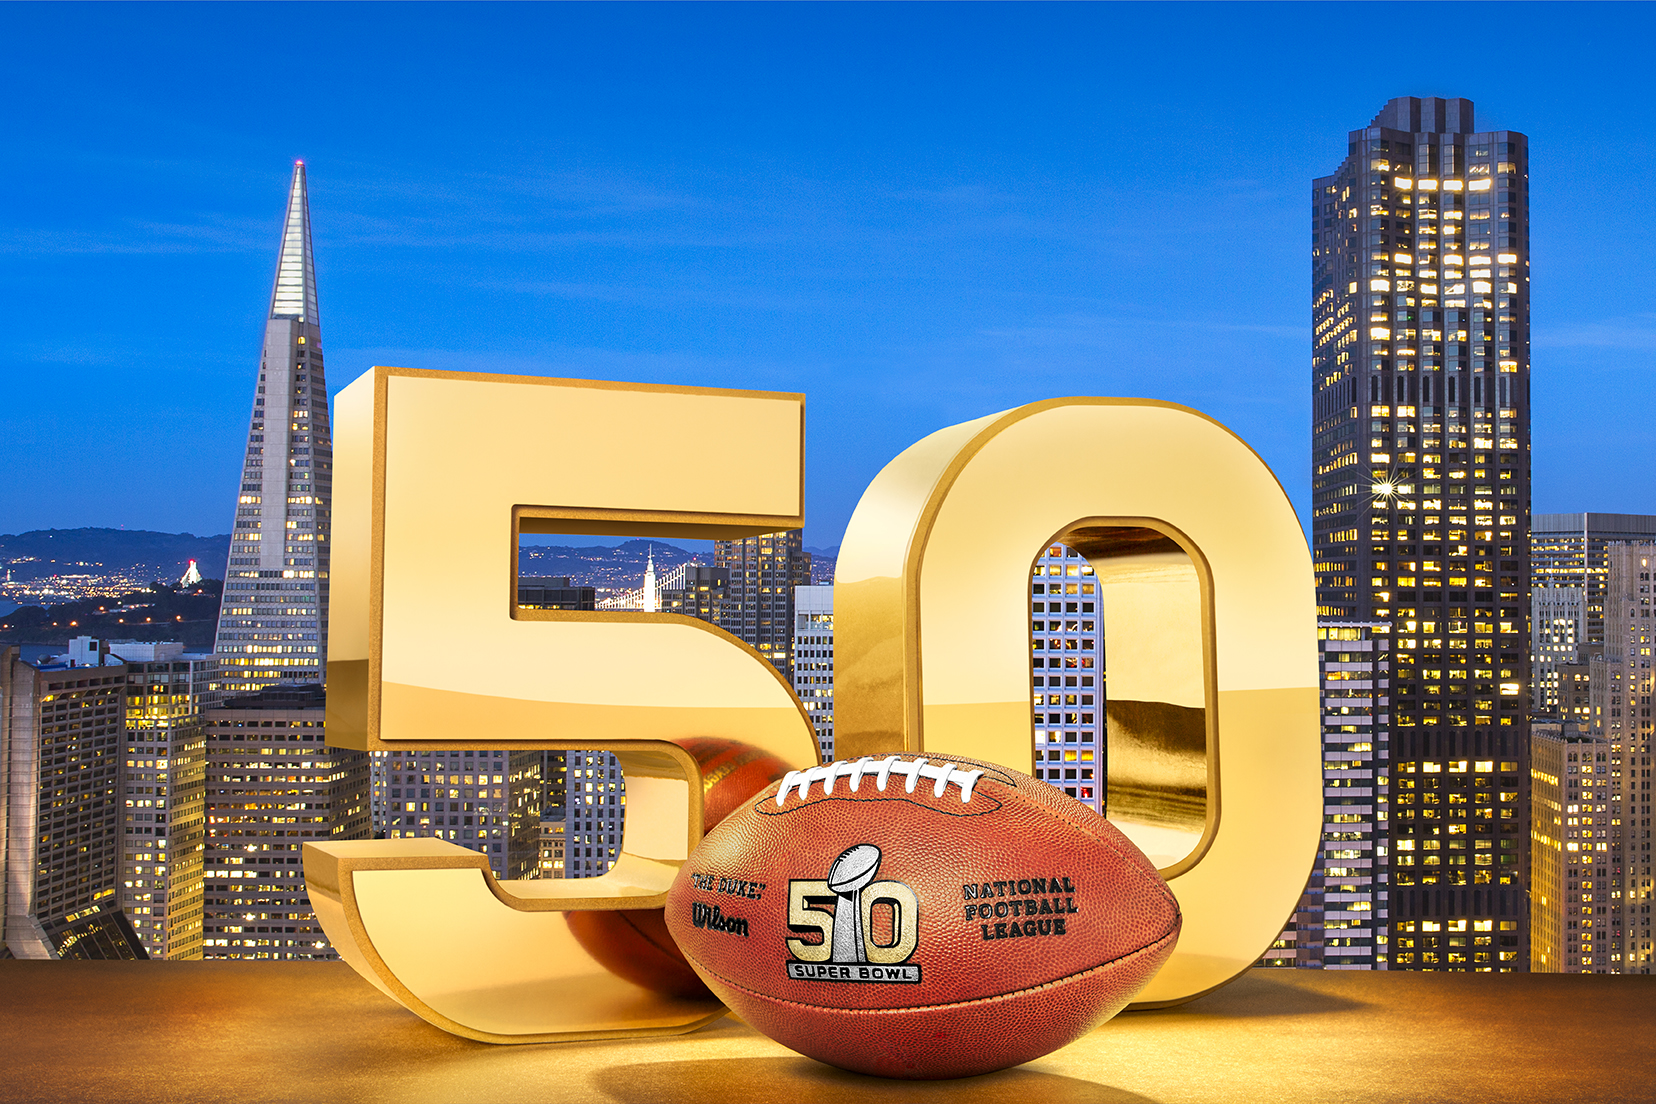 ads, advertising, super bowl, super bowl commercials, dealnews, football, super bowl 50